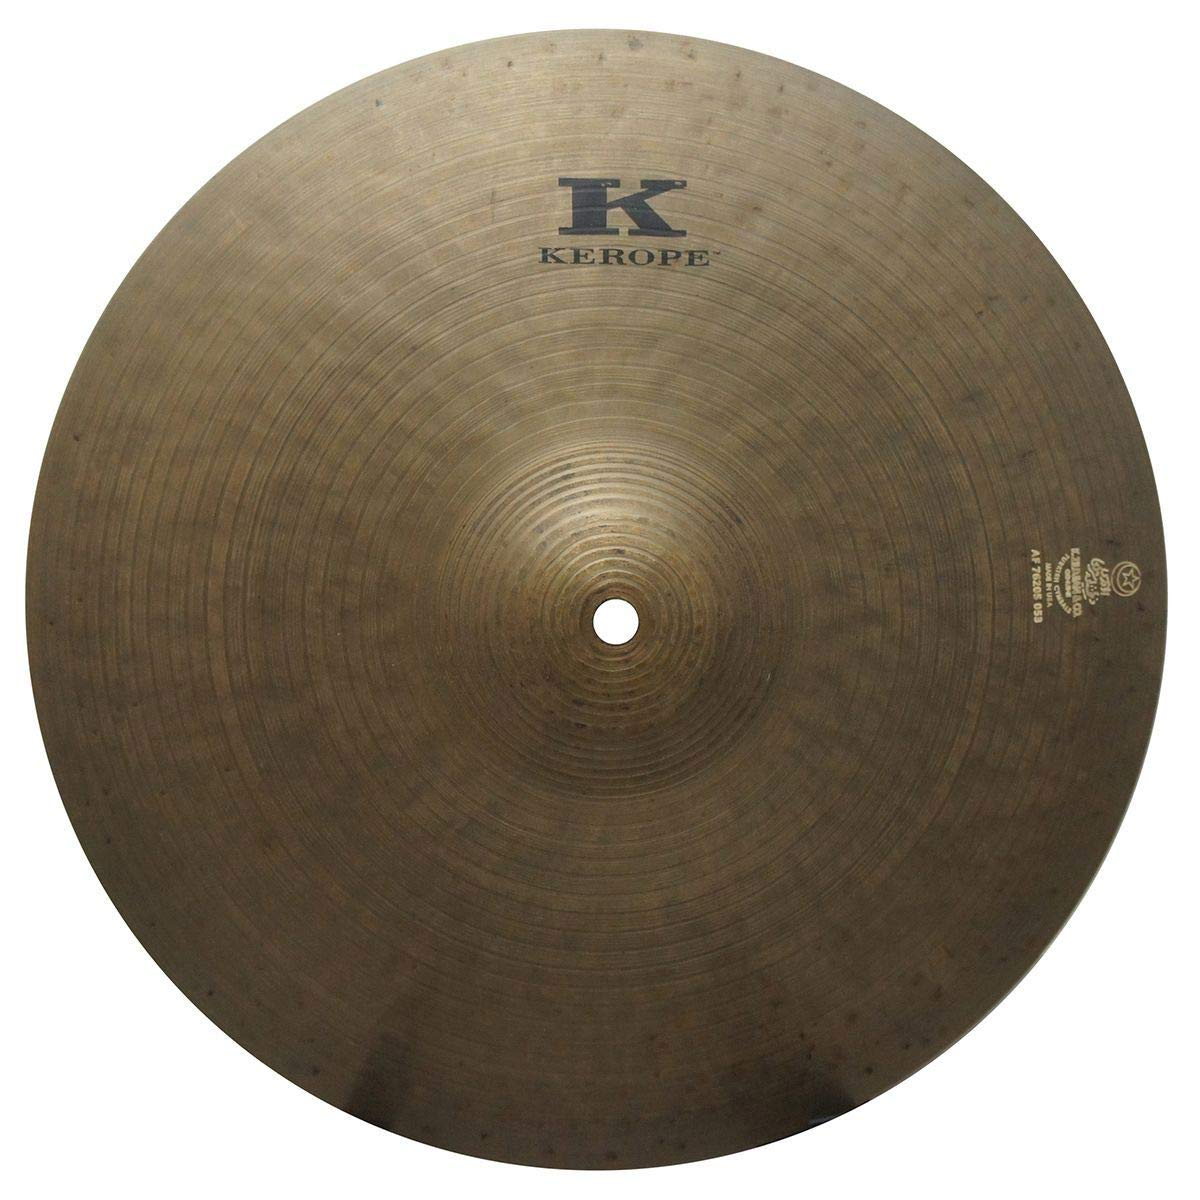 Zildjian Kr14Ht Kerope 14 Inch Hihat Top Cymbal With Dark & Complex Sound - Used ZIL14-KR14HT-US